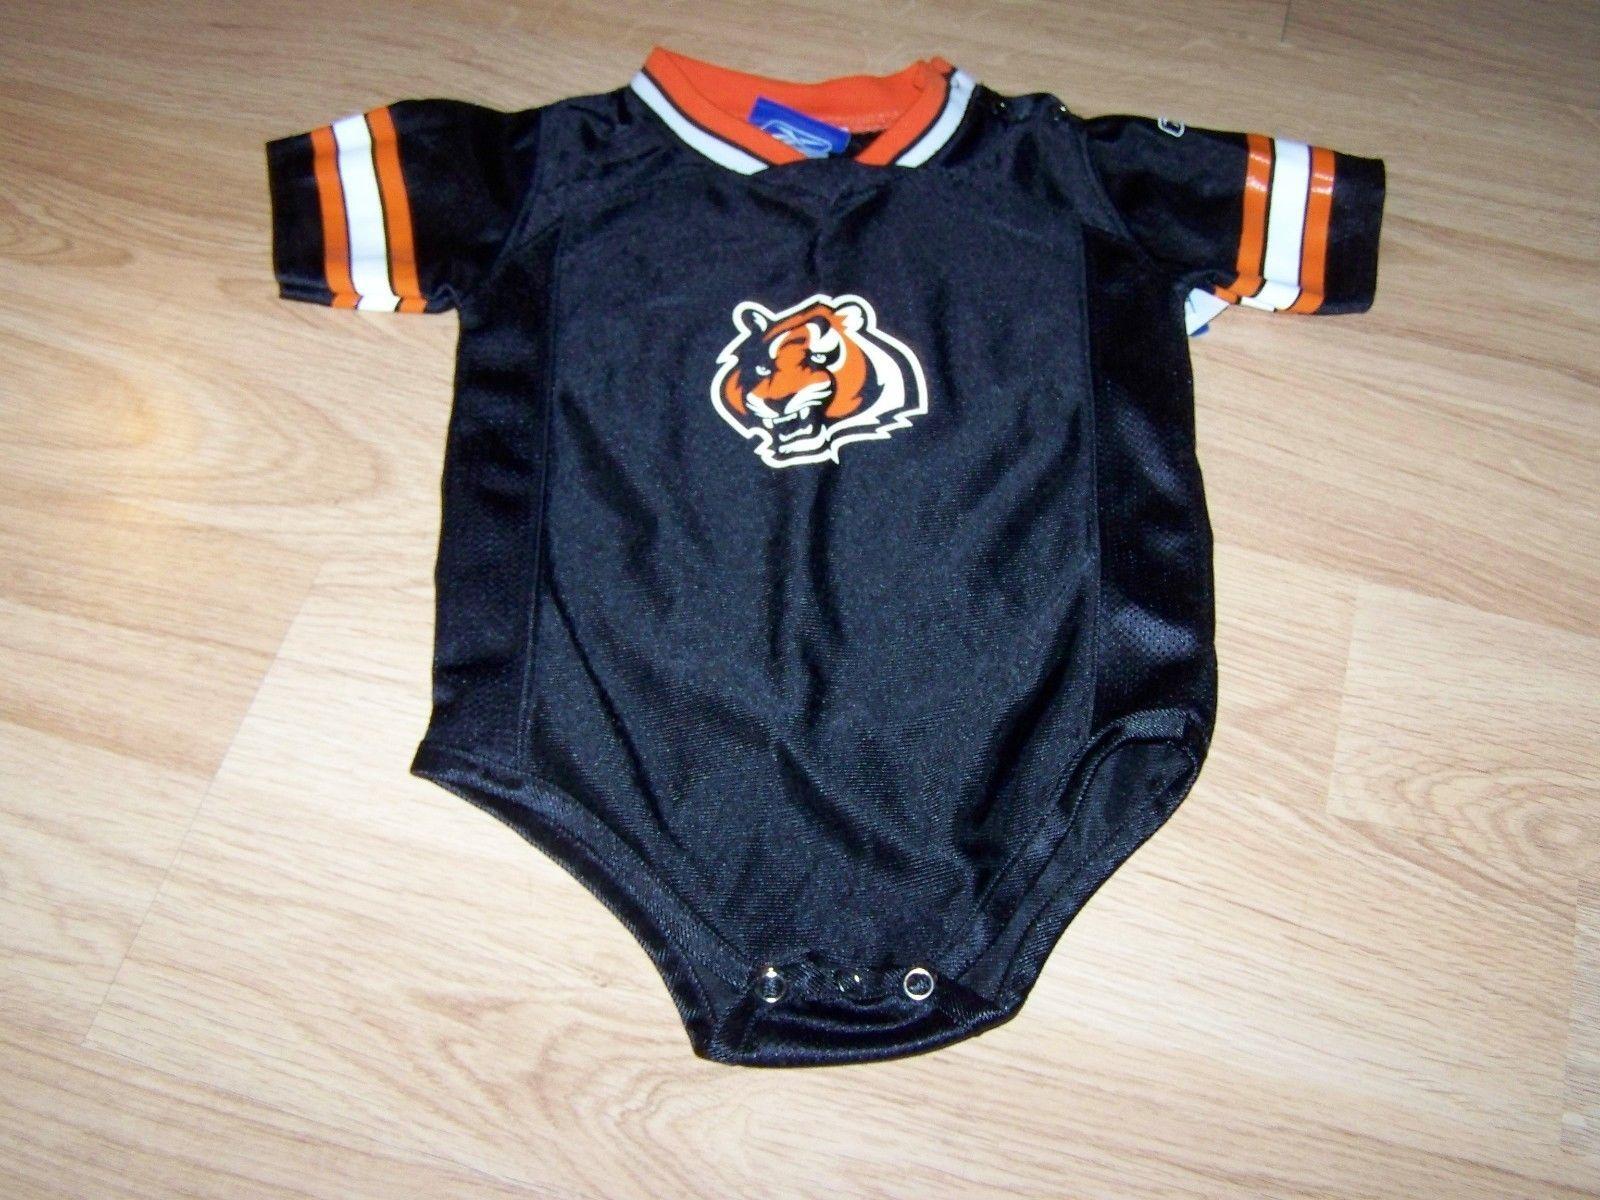 Infant Size 24 Months Cincinnati Bengals One Piece Jersey Black Orange Reebok